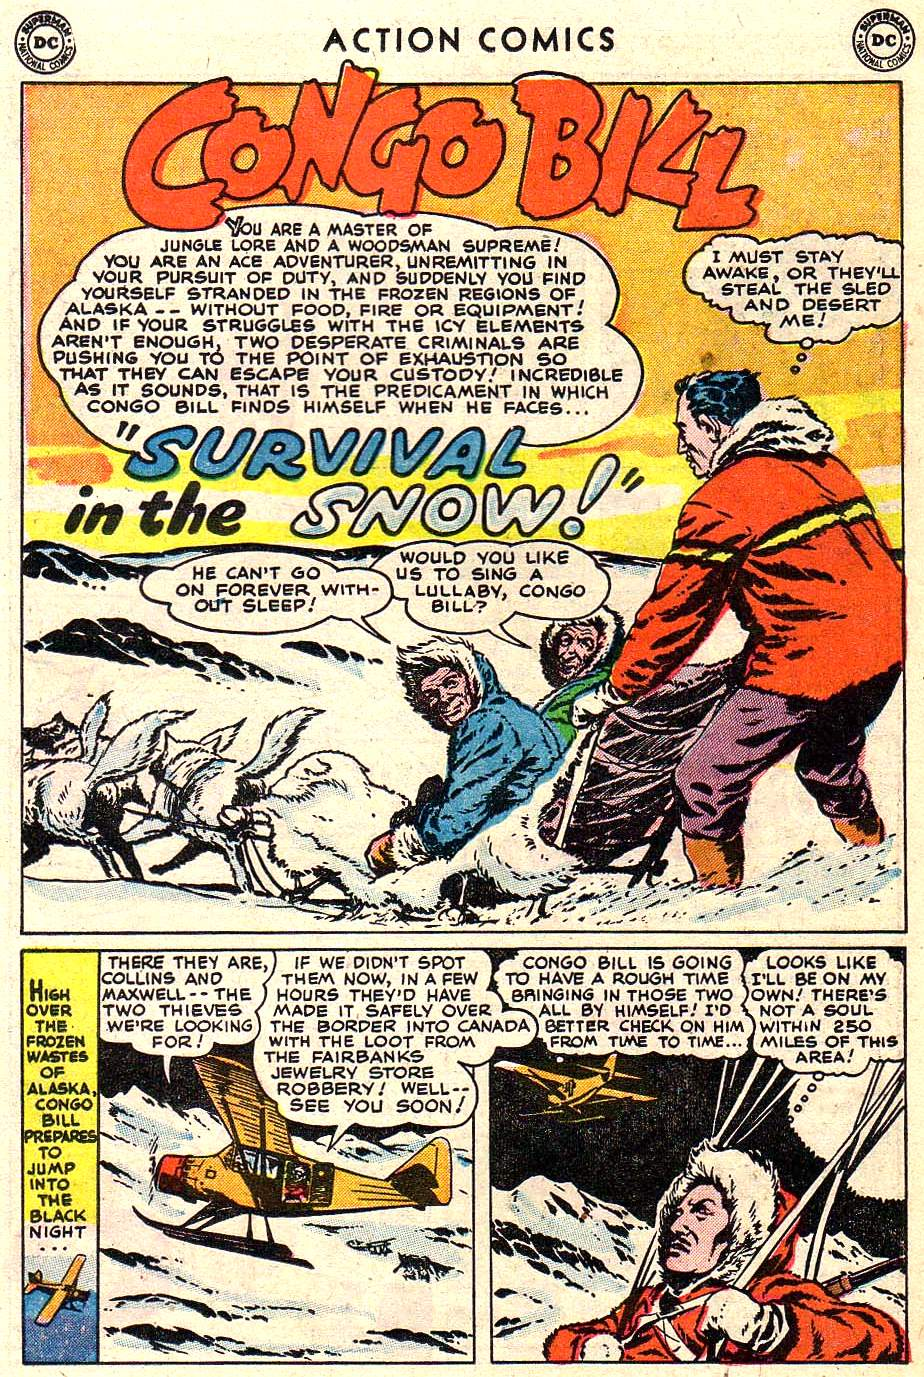 Action Comics (1938) 172 Page 16